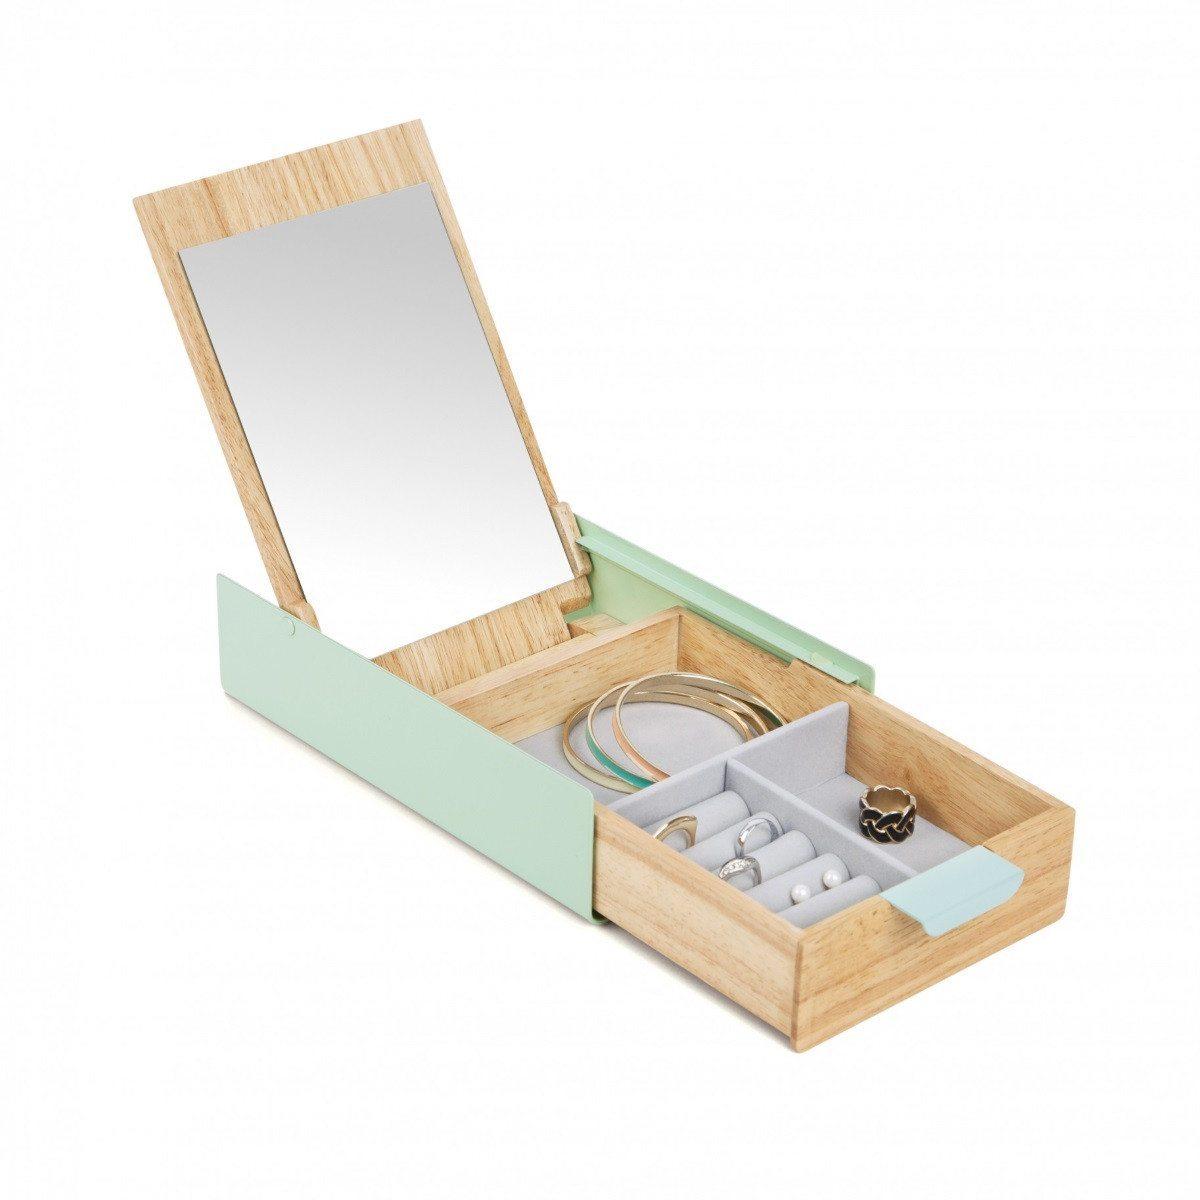 "Joyero con espejo ""Reflexión box"" para guardar tus tesoros"